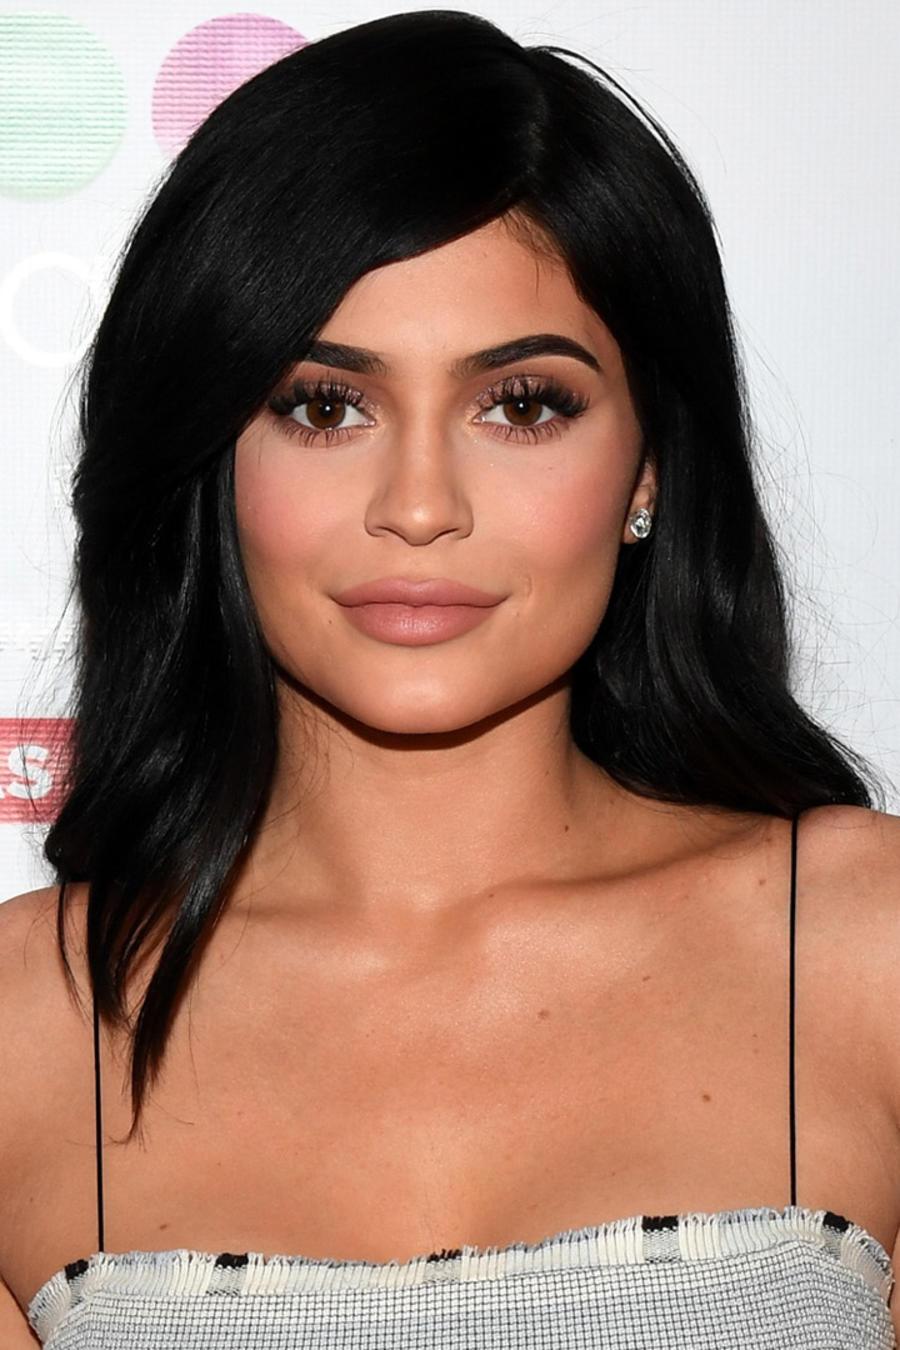 Kylie Jenner en el Fashion Show mall en Las Vegas en abril de 2017